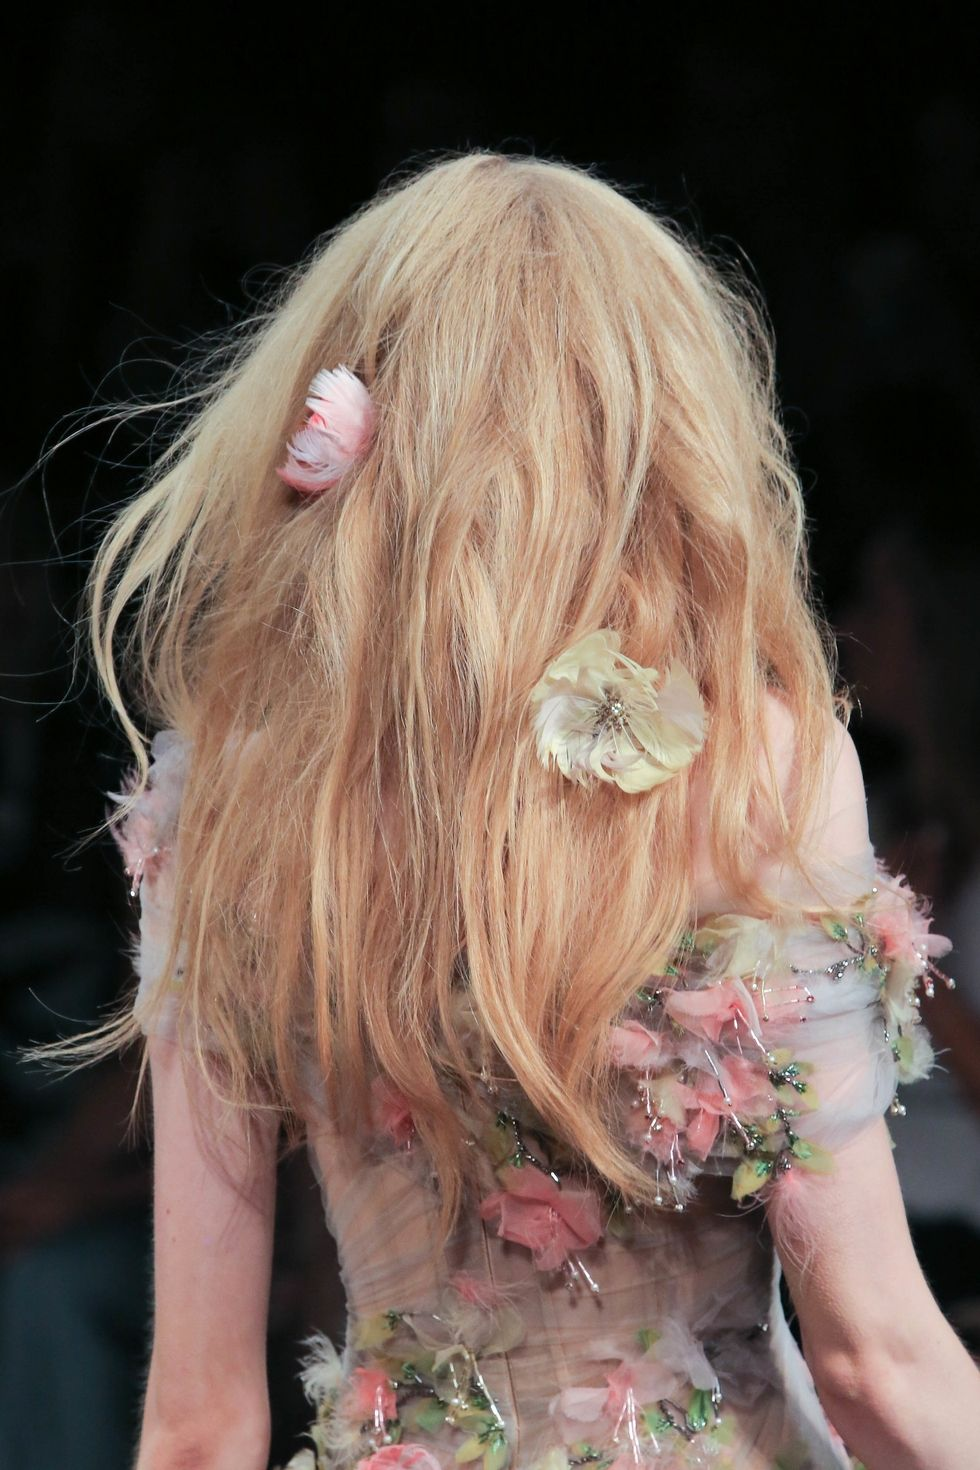 Peinados sencillos con accesorios tendencia 2018, flores 2